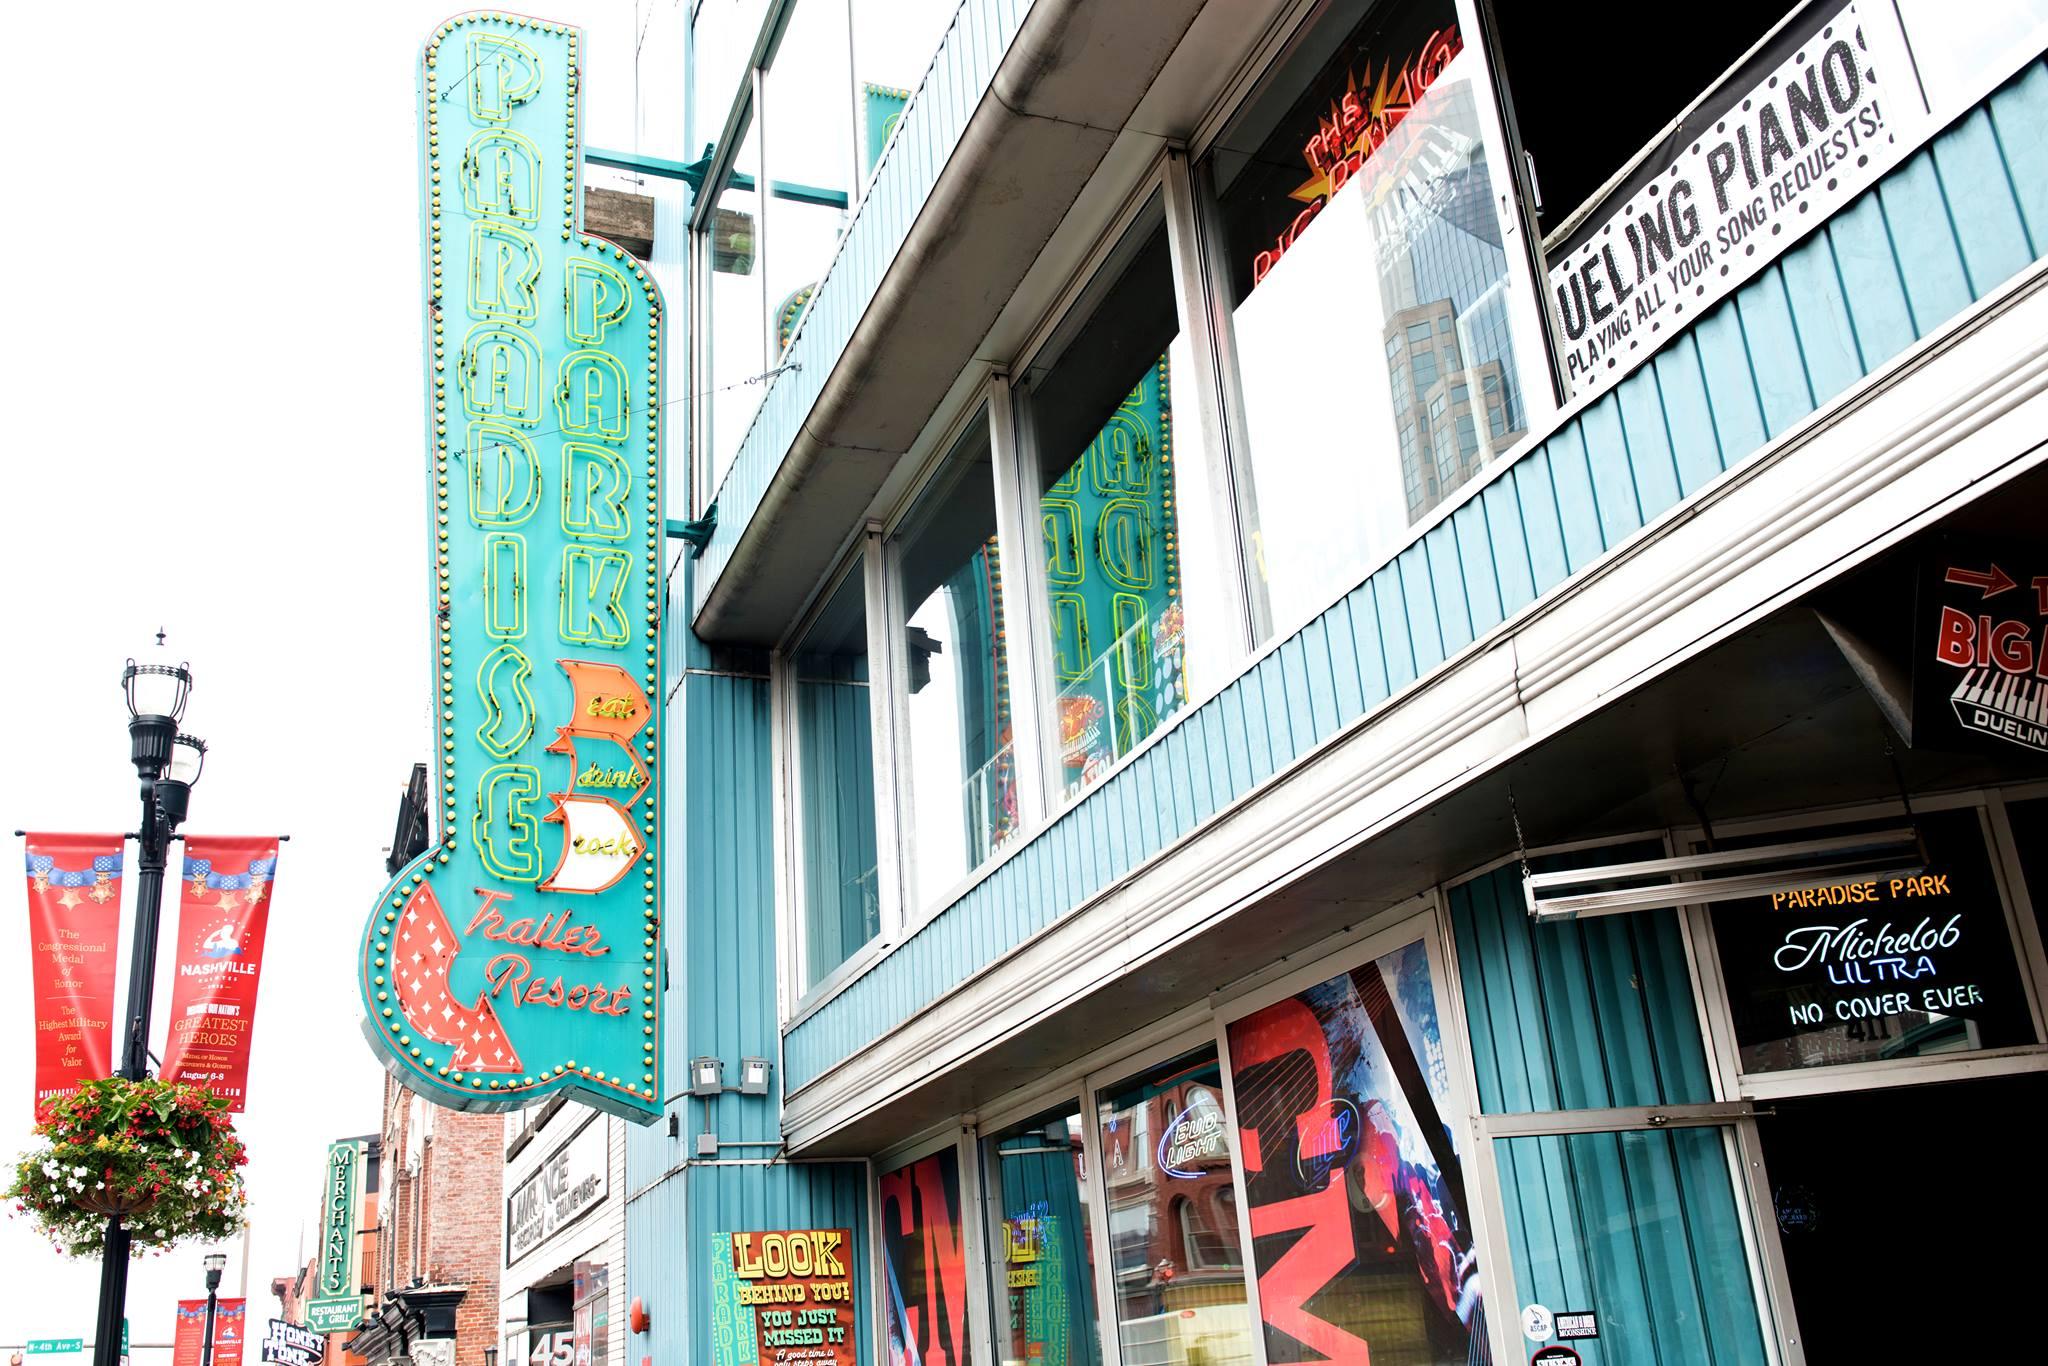 Paradise Park Trailer Resort Is Reborn in Nashville This Weekend